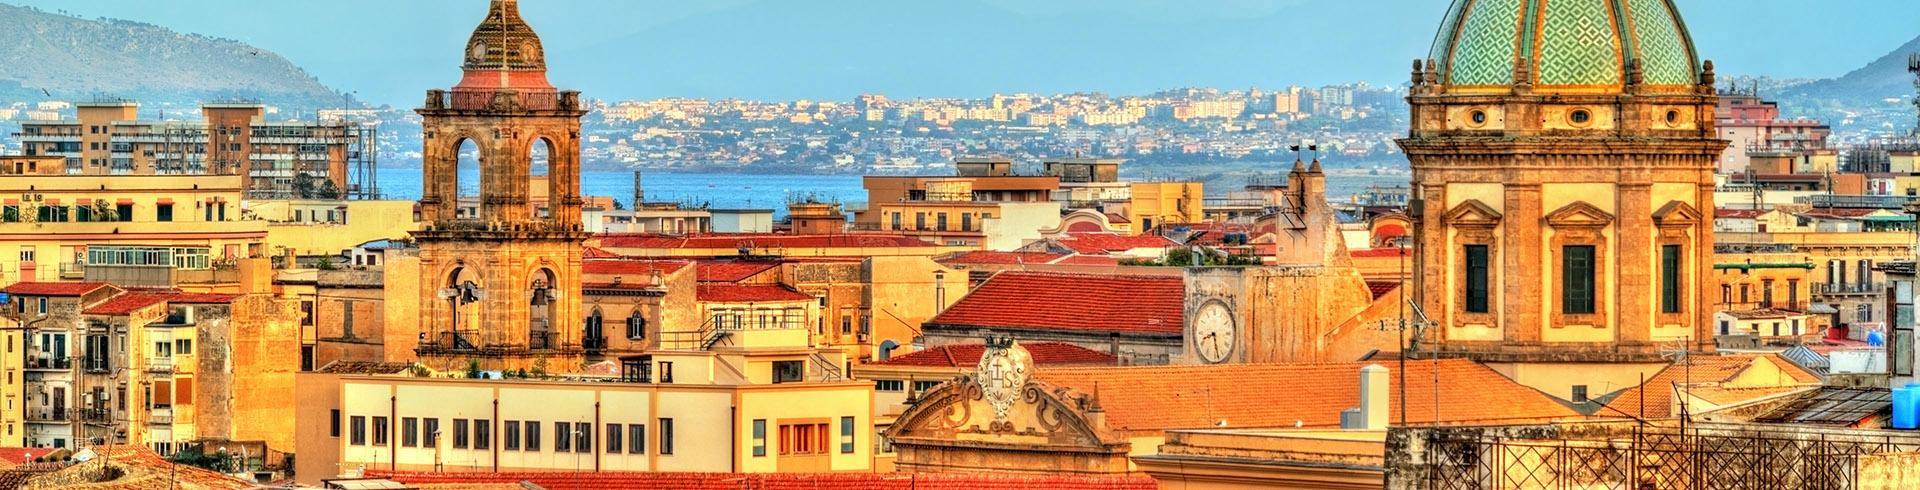 palerme italie europe 100 destinations en direct de nice vols destinations a roport. Black Bedroom Furniture Sets. Home Design Ideas